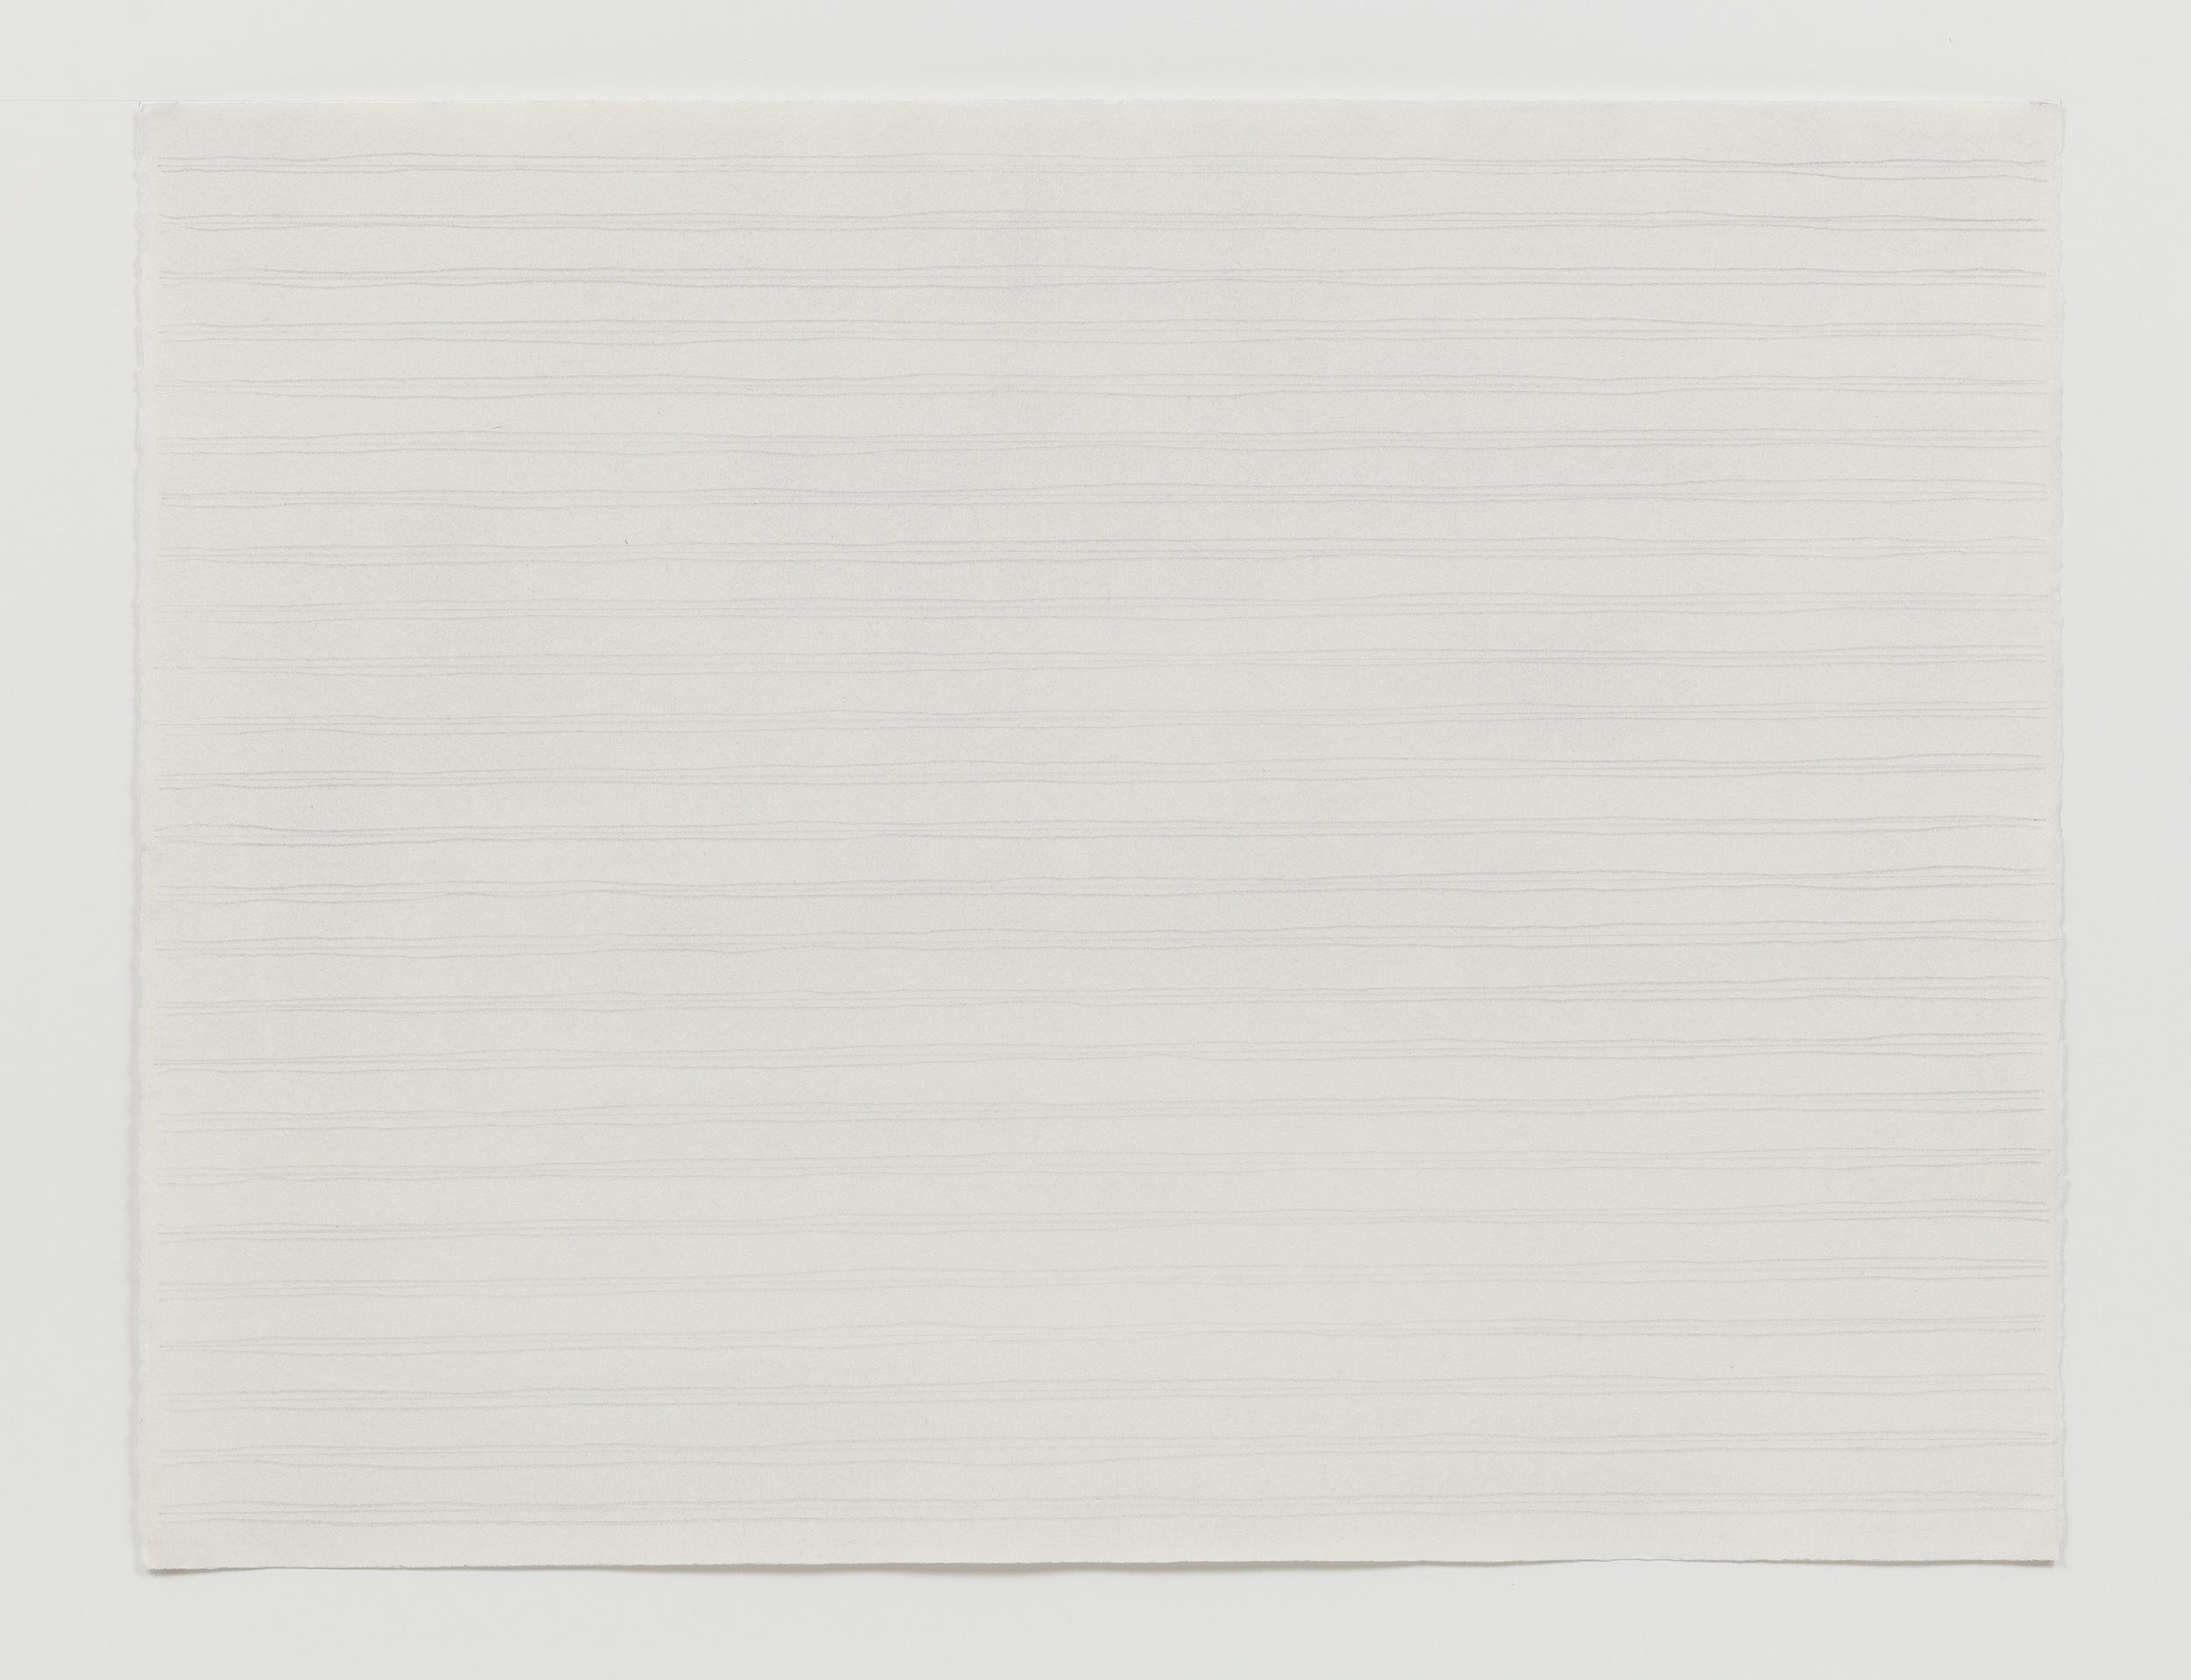 Rudolf de Crignis, Painting No. 91124, 1991